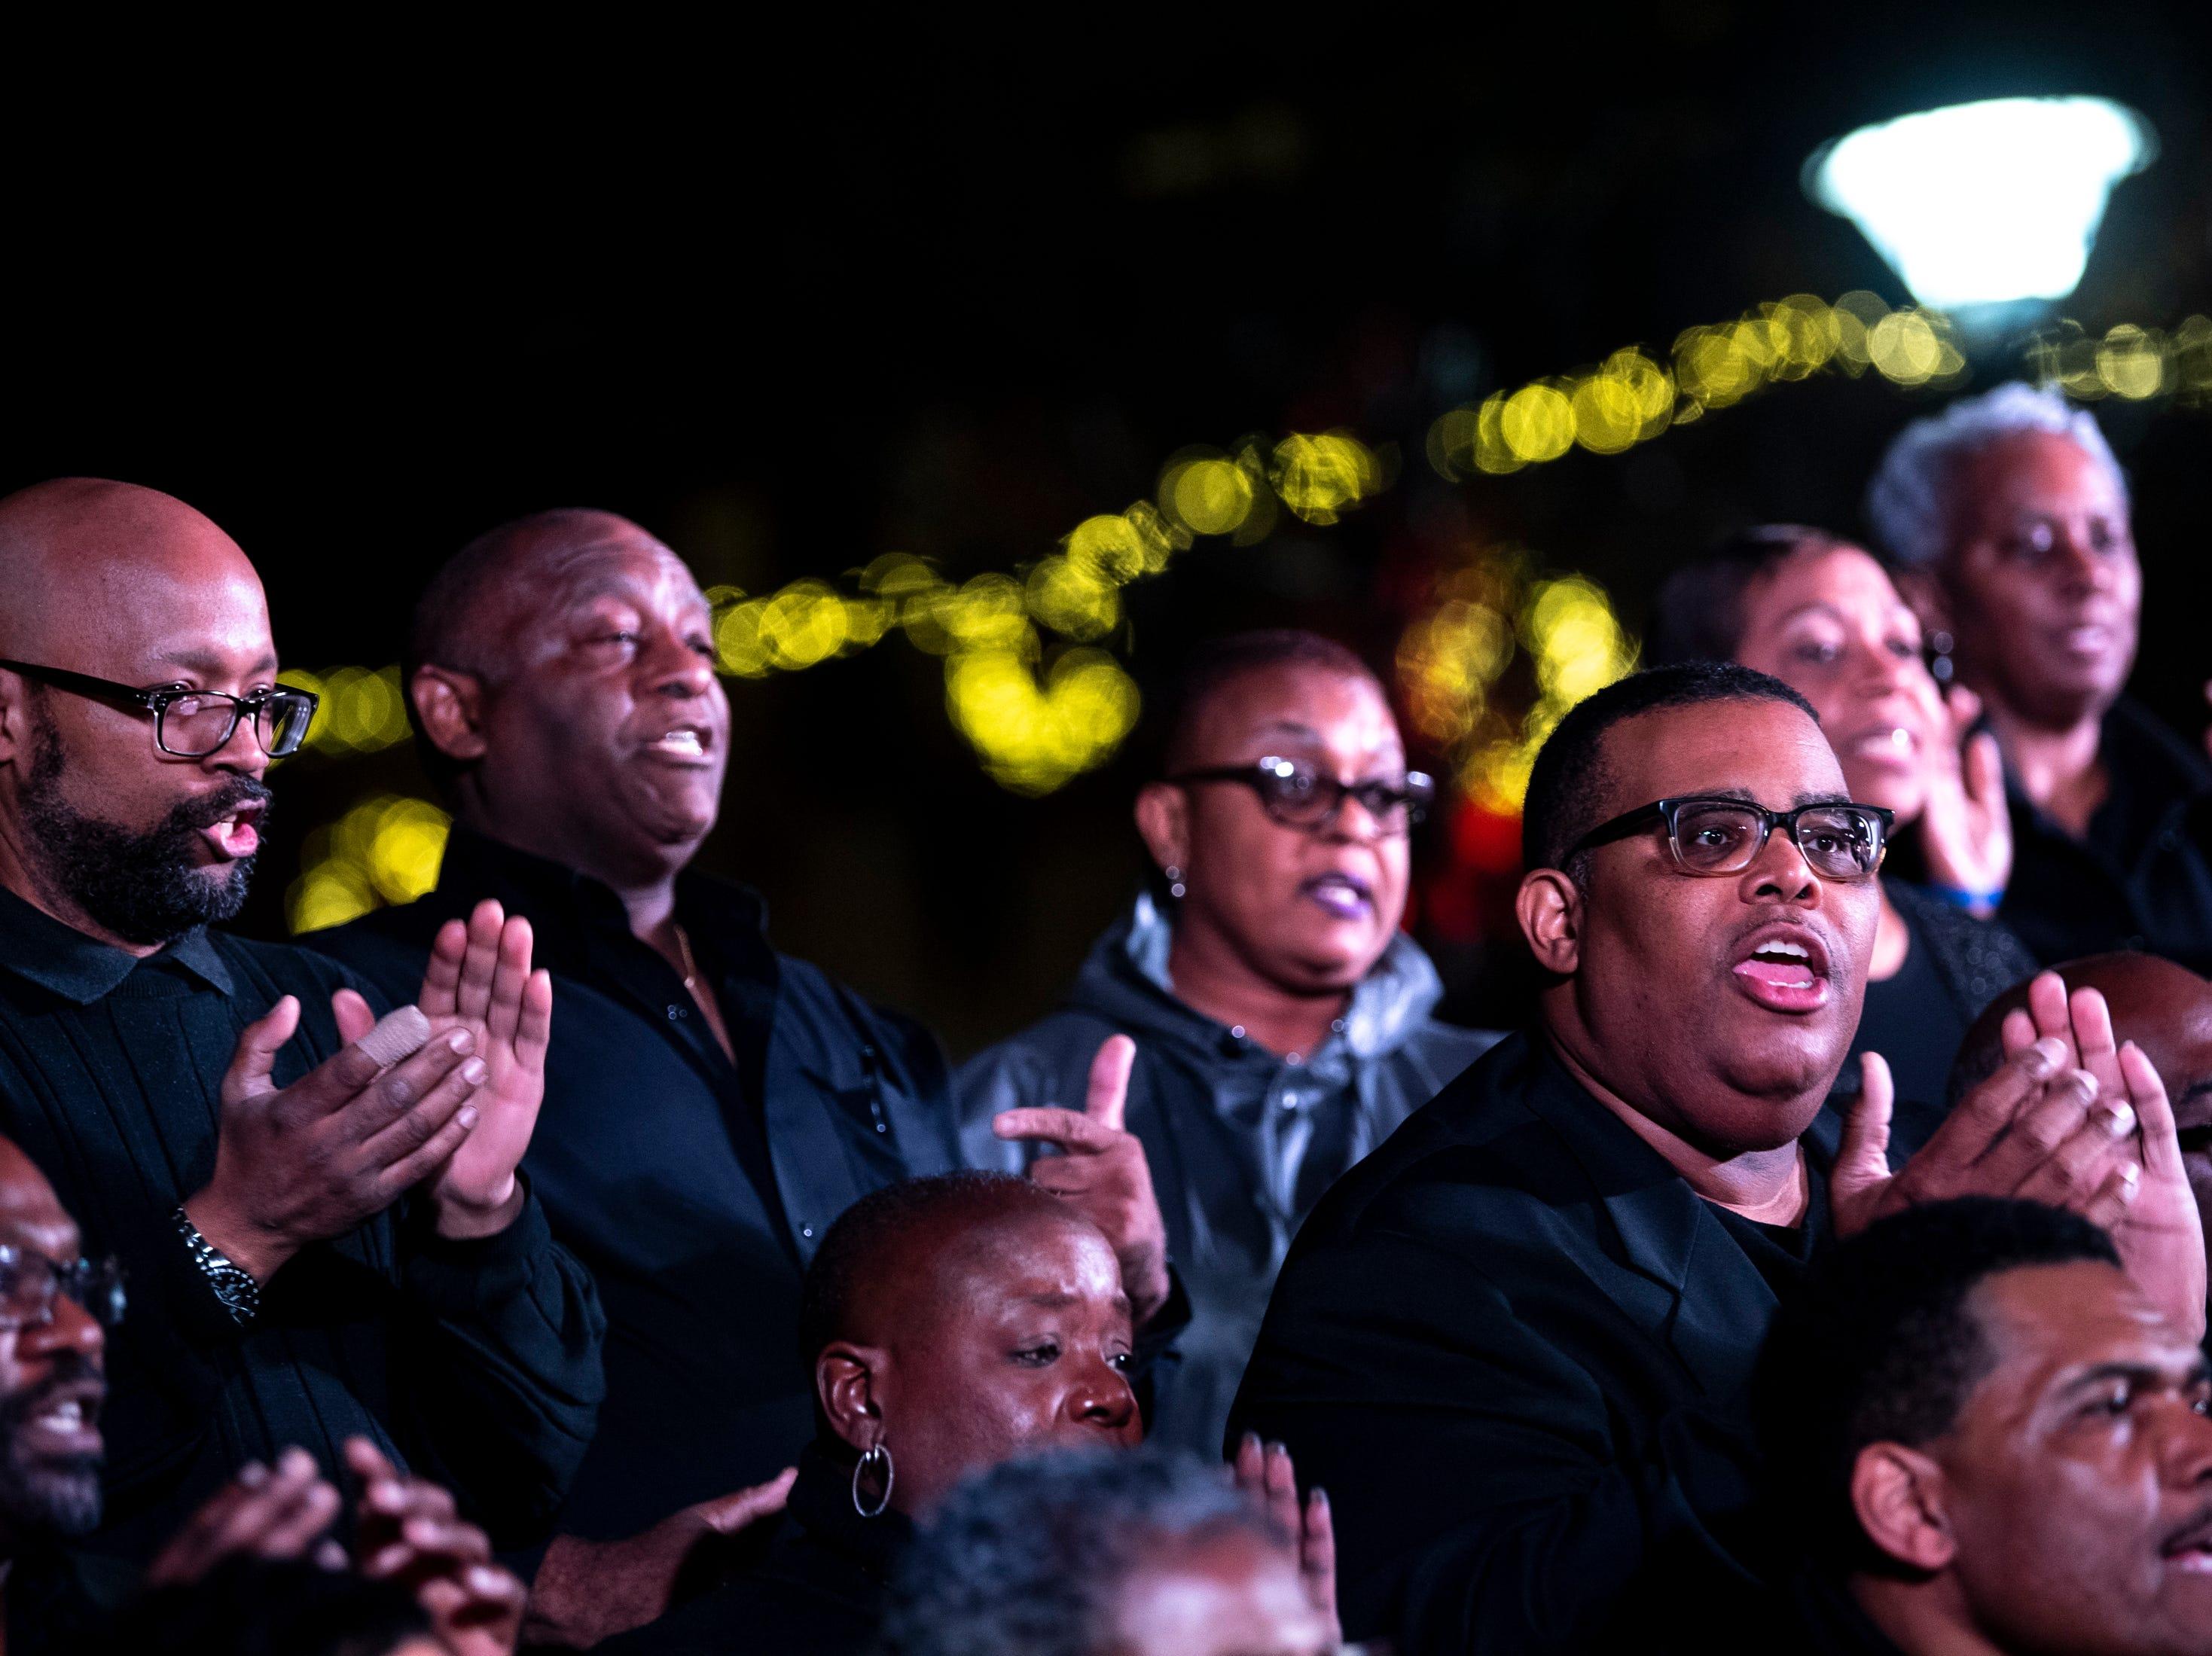 The Lake Providence Missionary Baptist Church Choir performs during the Metro Nashville Christmas Tree Lighting event at Public Square Park in Nashville, Tenn., Friday, Nov. 30, 2018.